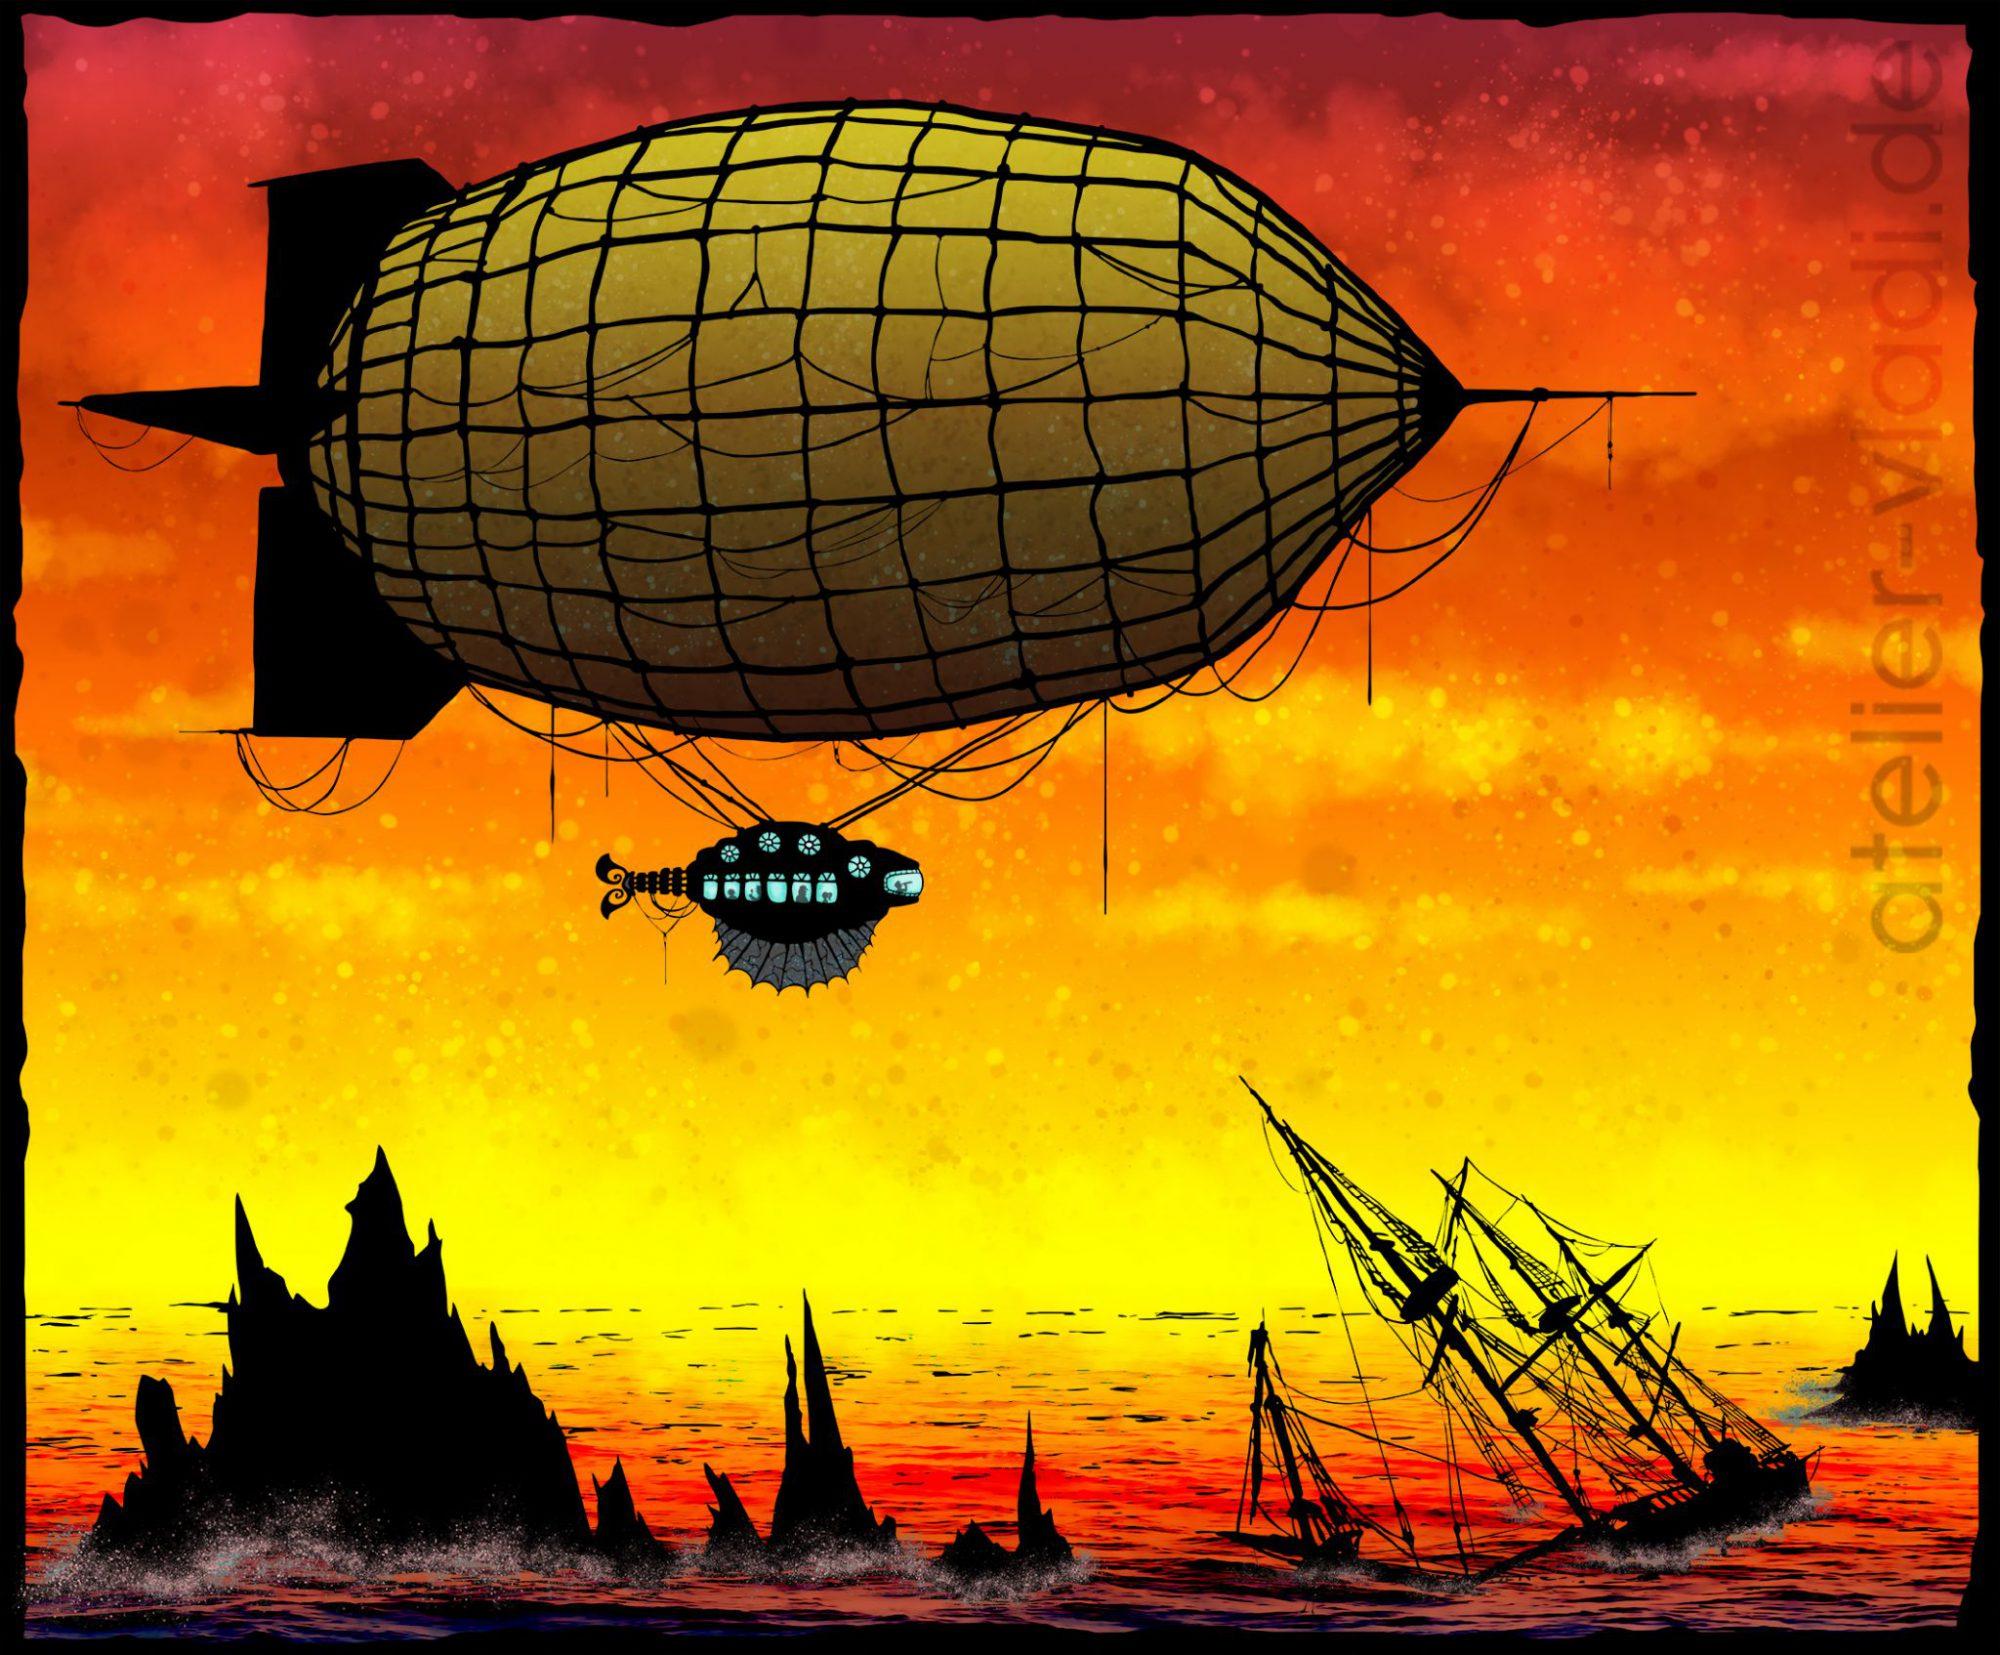 Luftschiff Luftschiffe Silhouette Zeppelin Ballon Steampunk